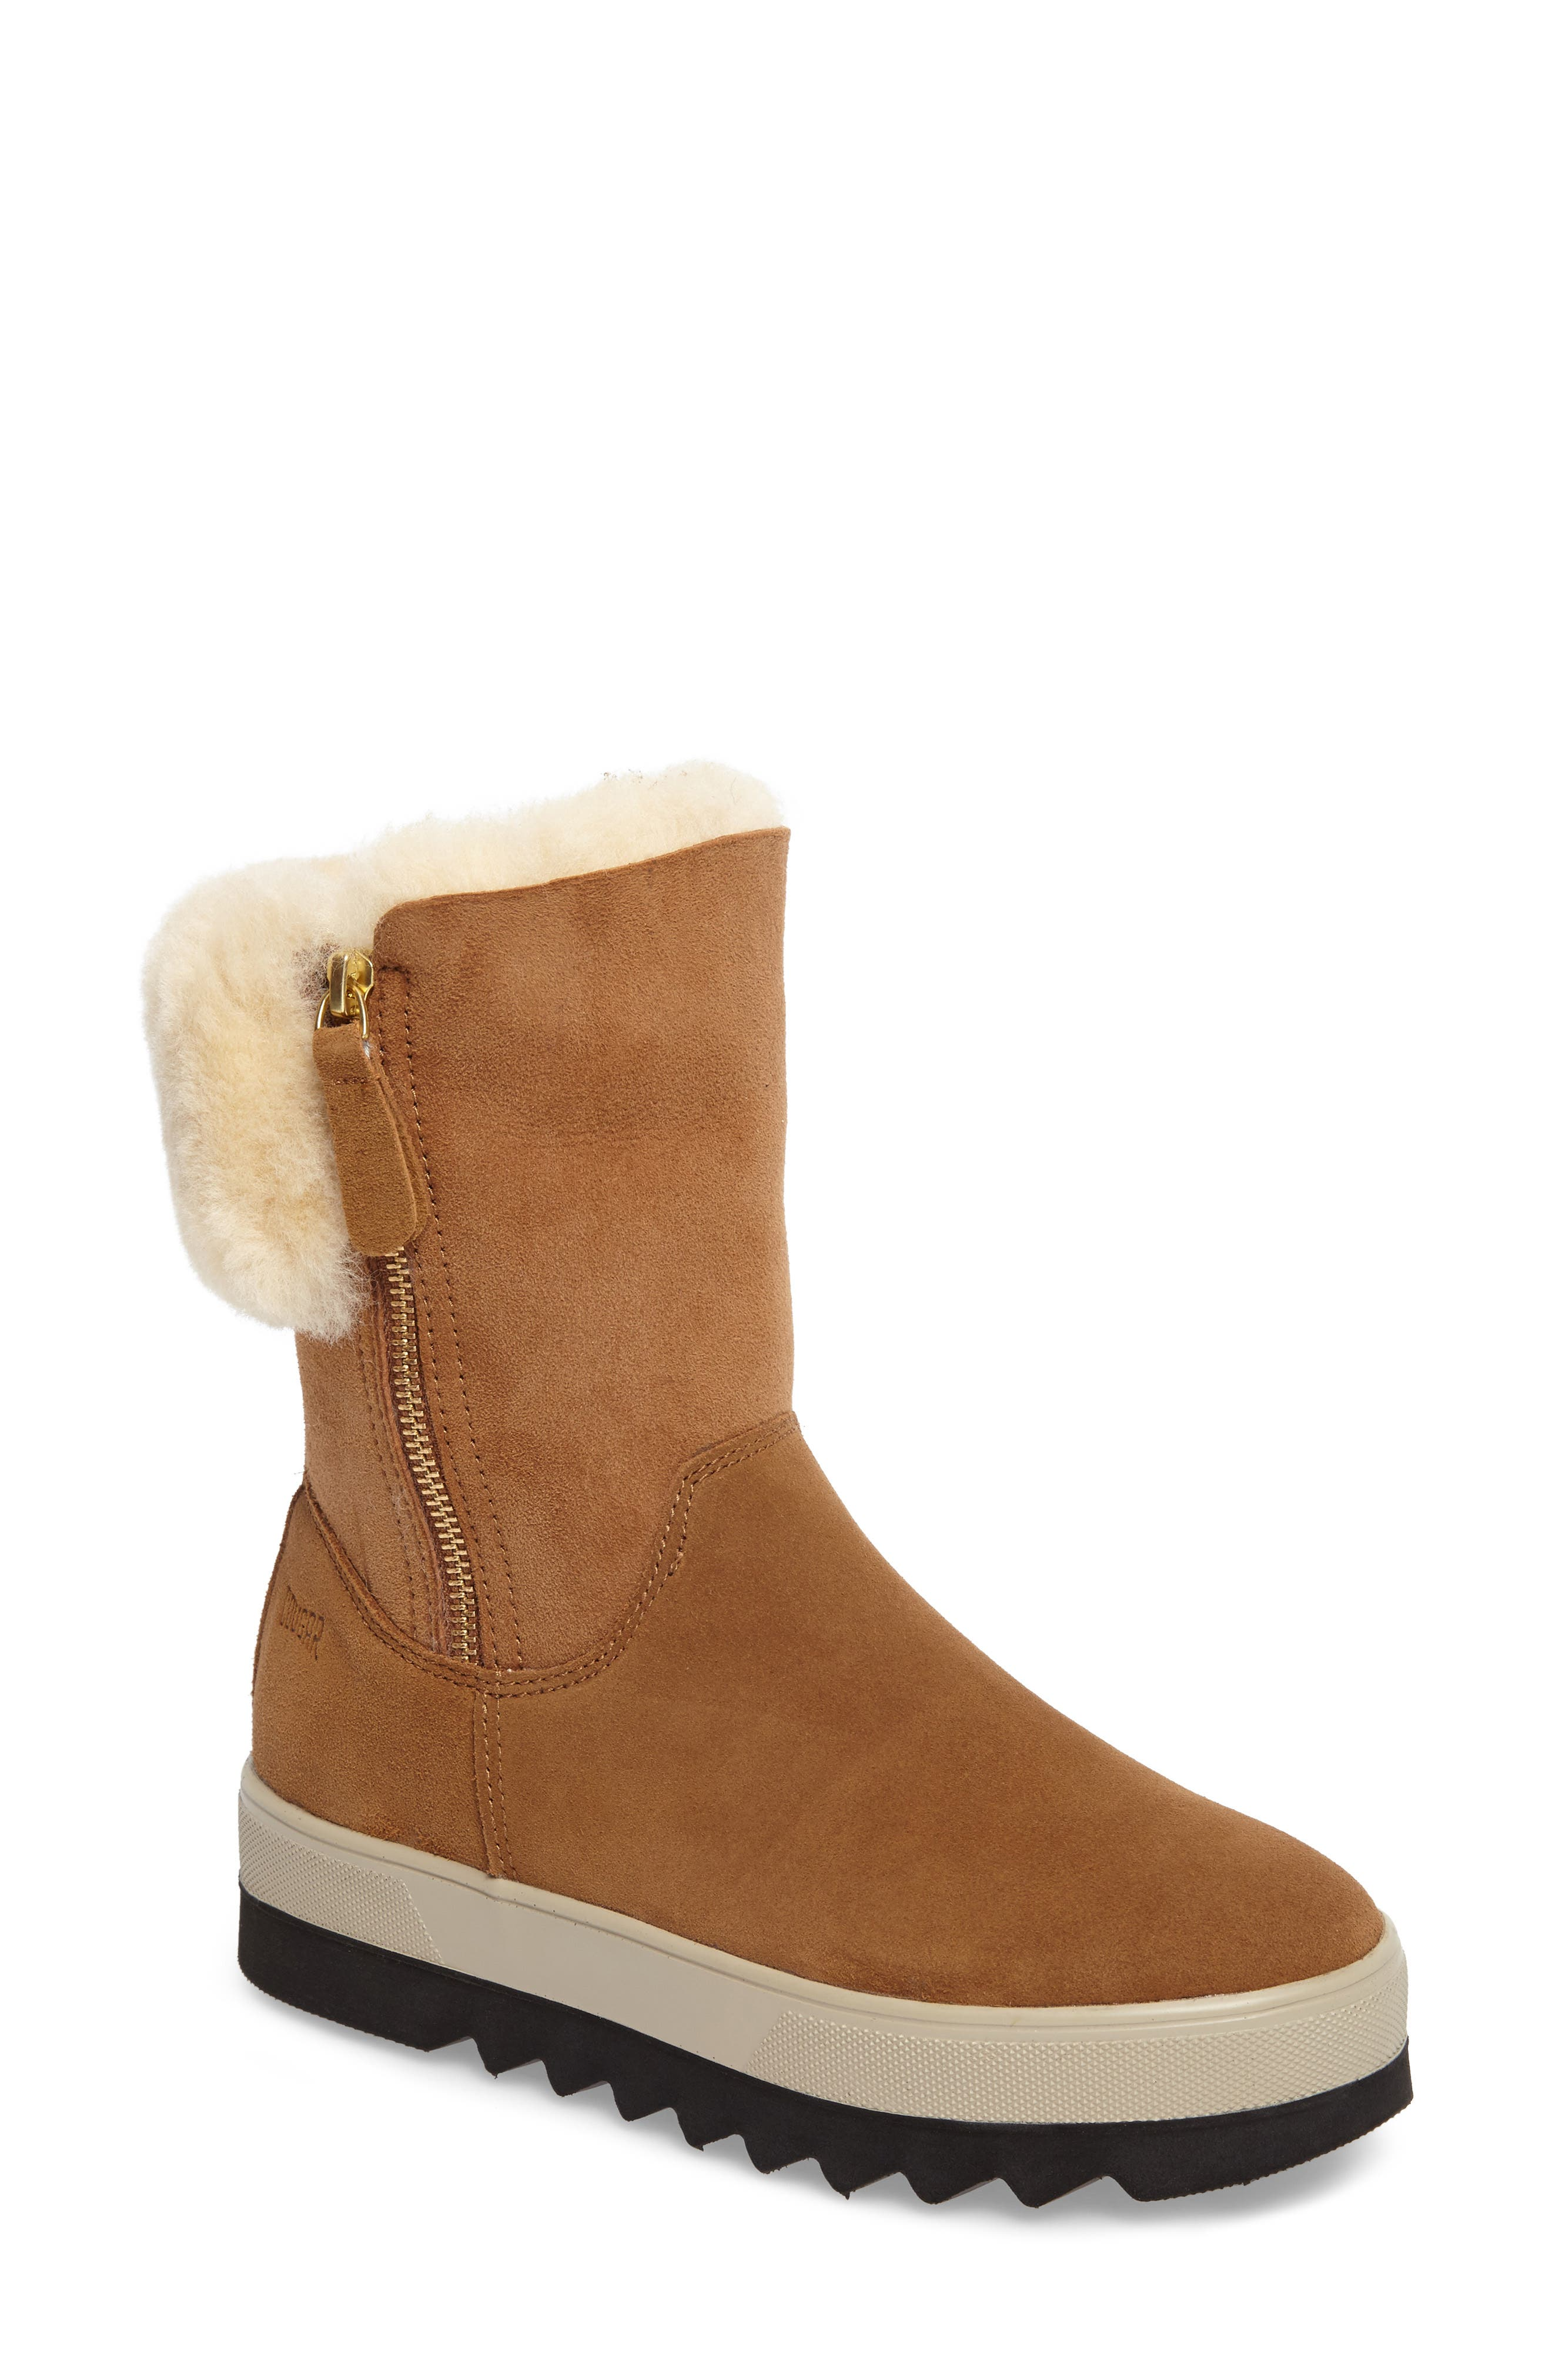 Main Image - Cougar Vera Genuine Shearling Boot (Women)